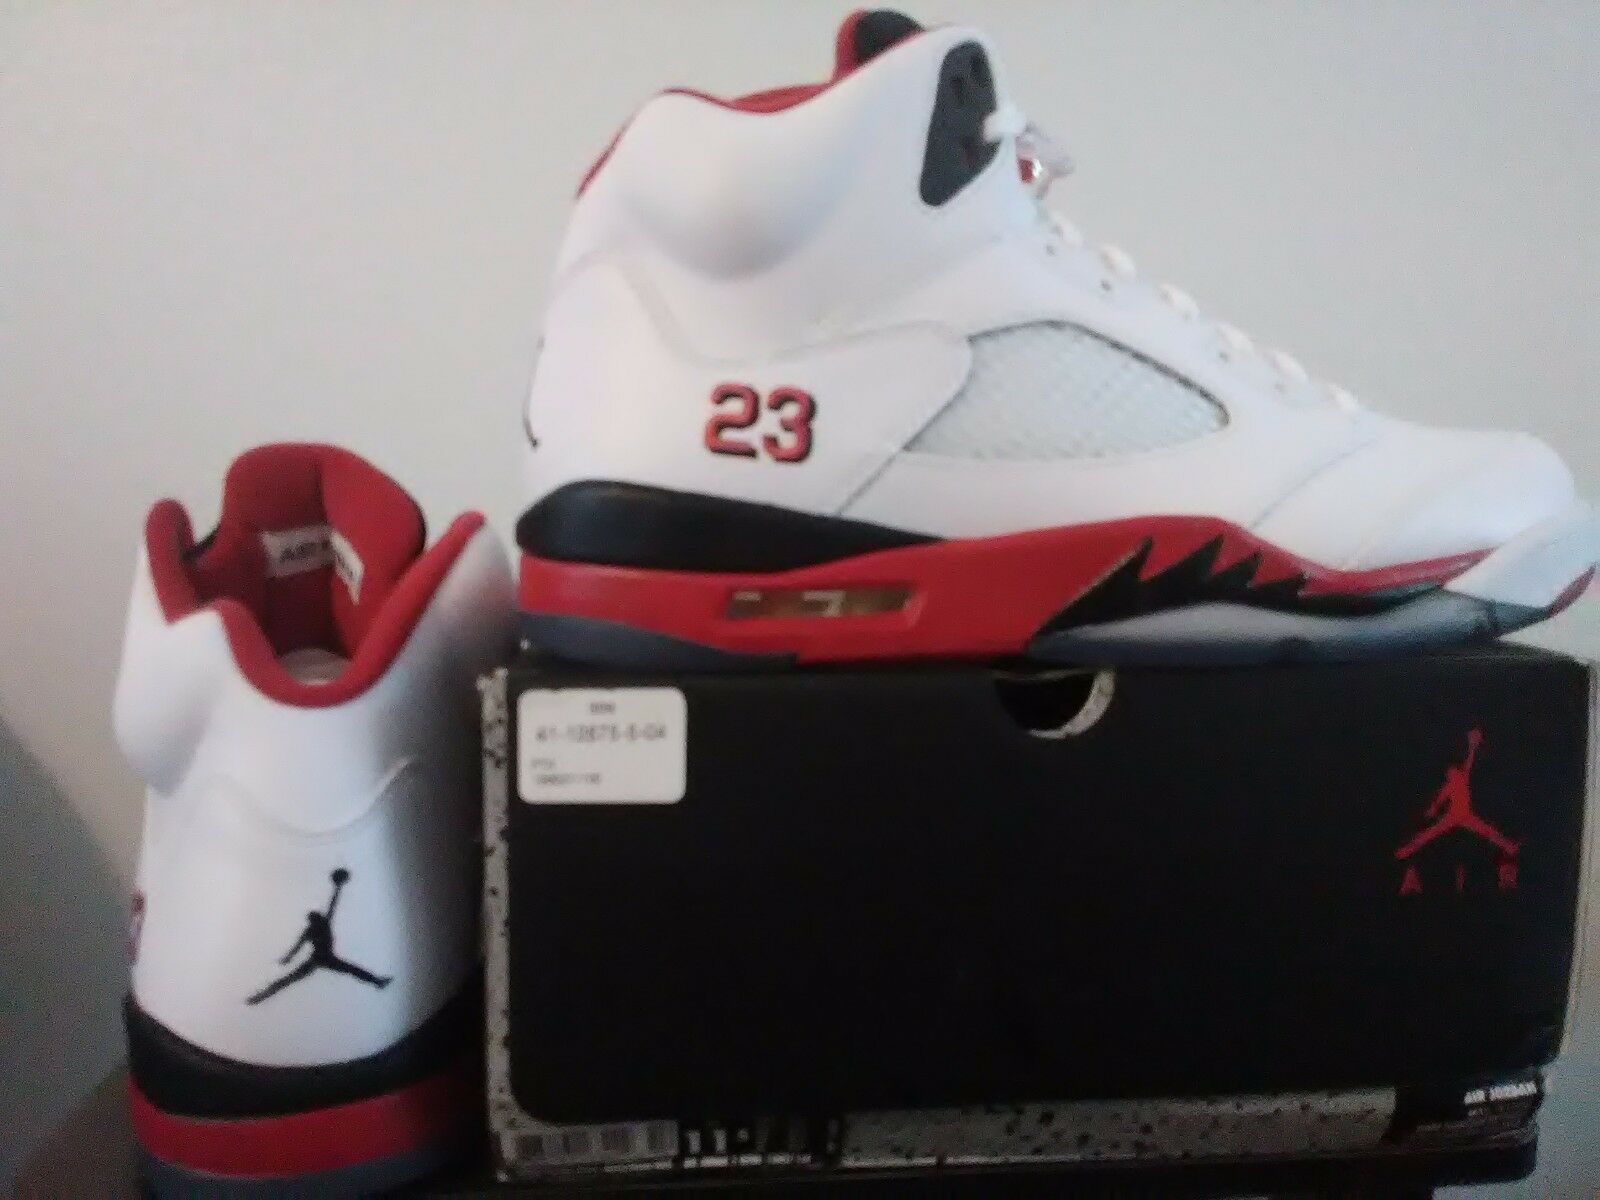 Air Jordan 5 Fire Red Low Retro OG 2013 AJ V Nike Mens Shoe 136027-120 Size 11.5